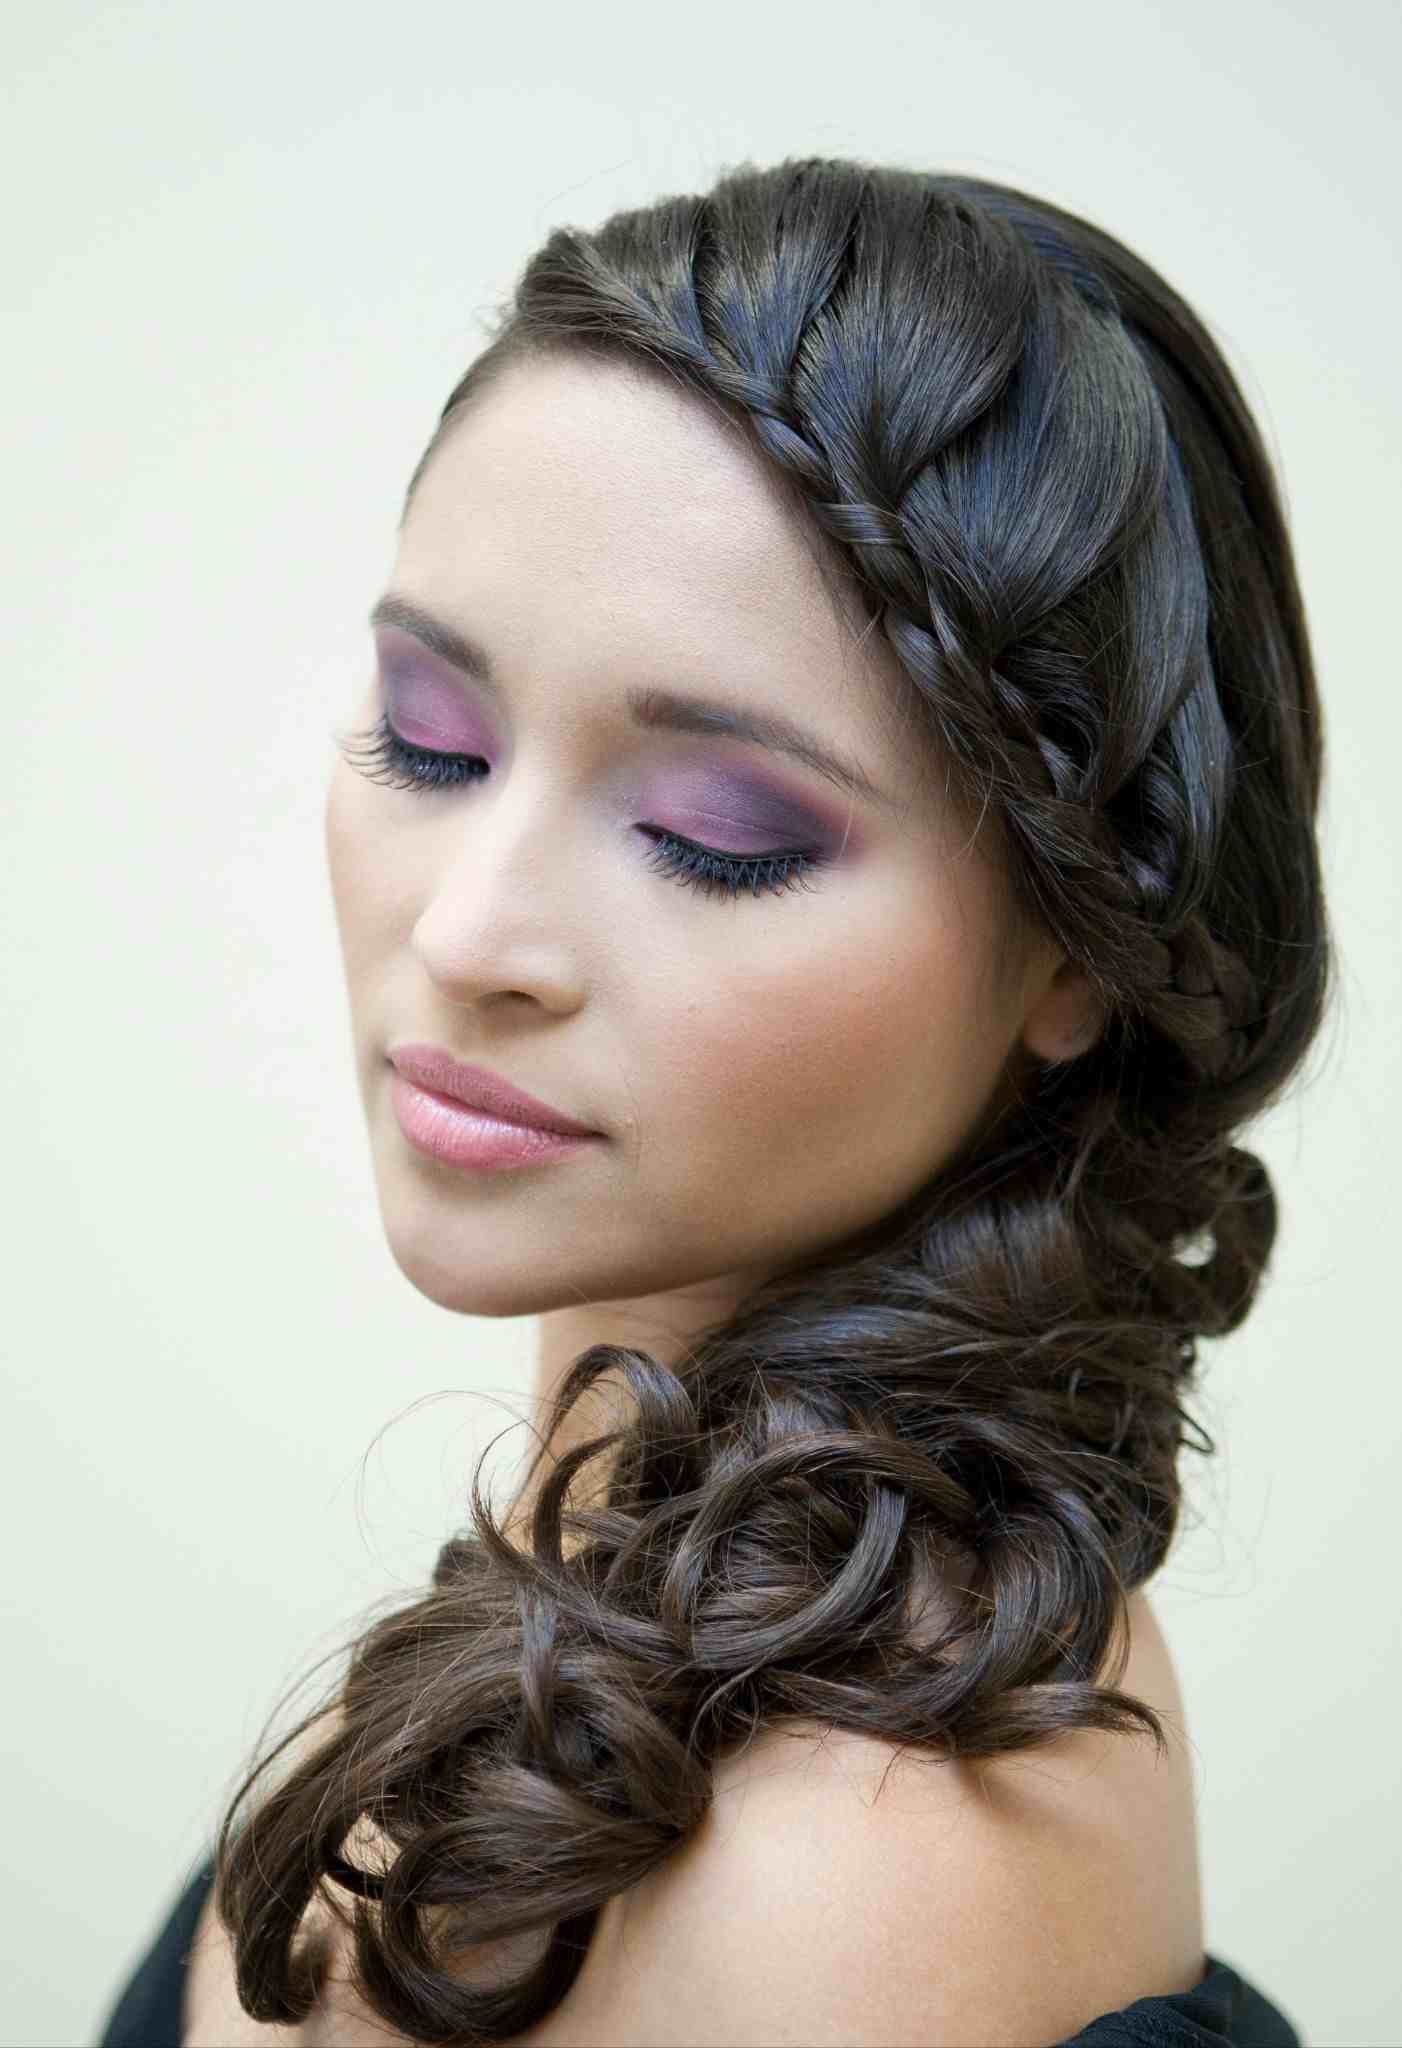 Top Houston Beauty Salons | Beauty Salons in Houston TX | My ...